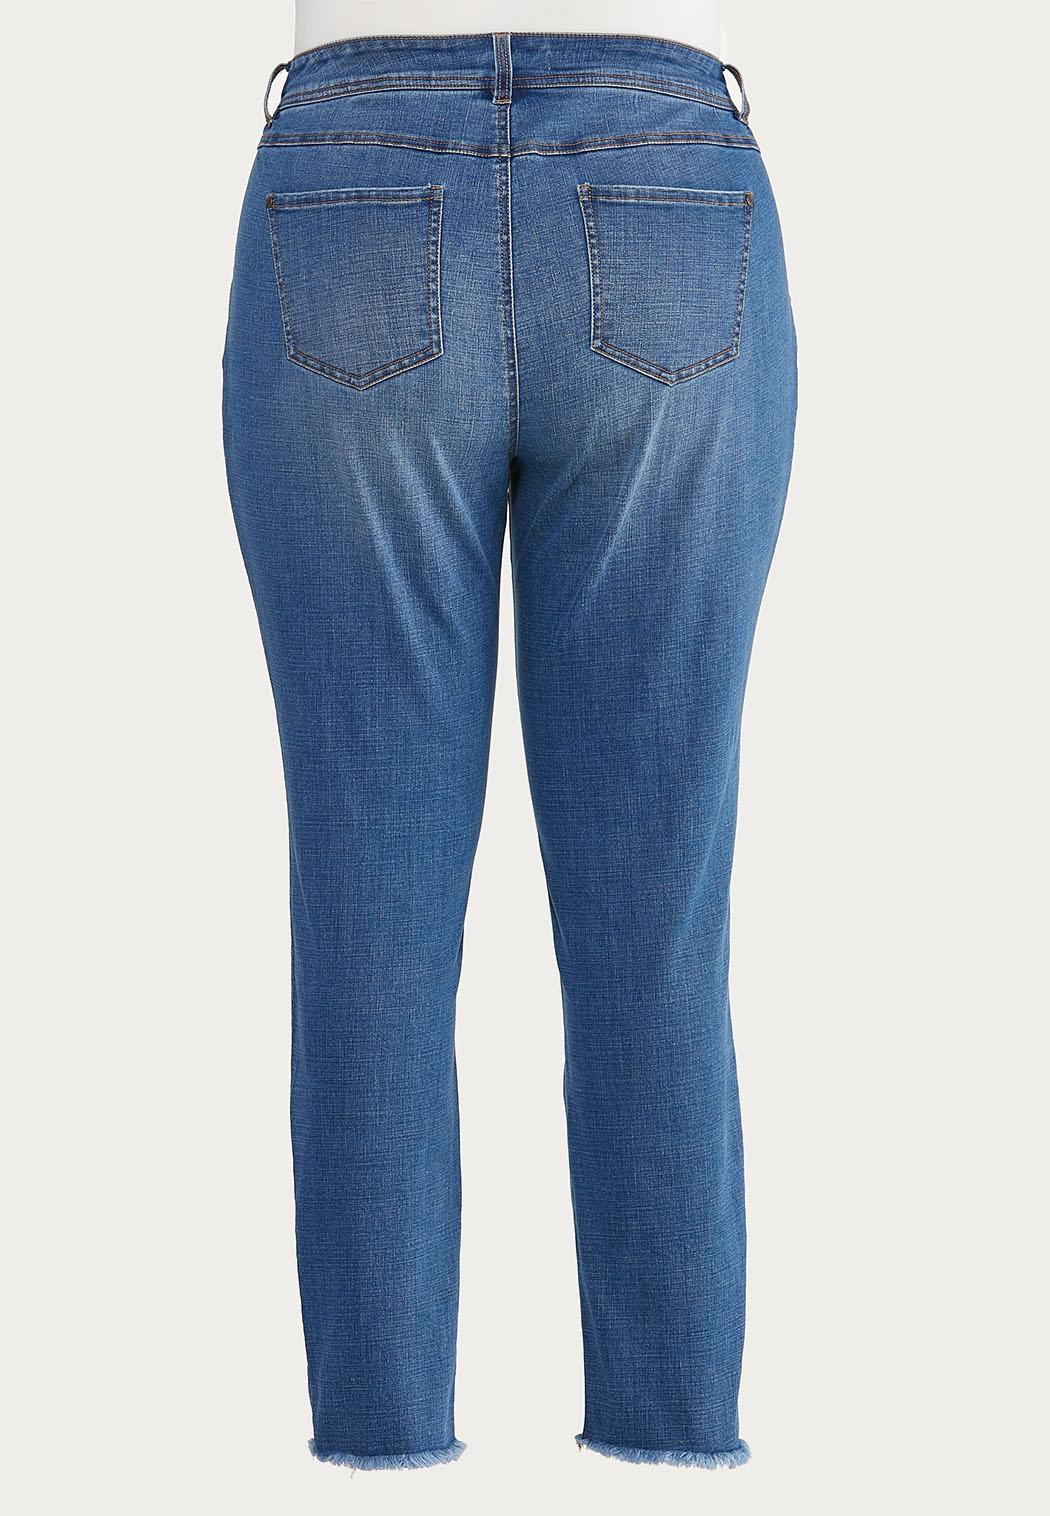 Plus Size Frayed Skinny Jeans (Item #44645880)